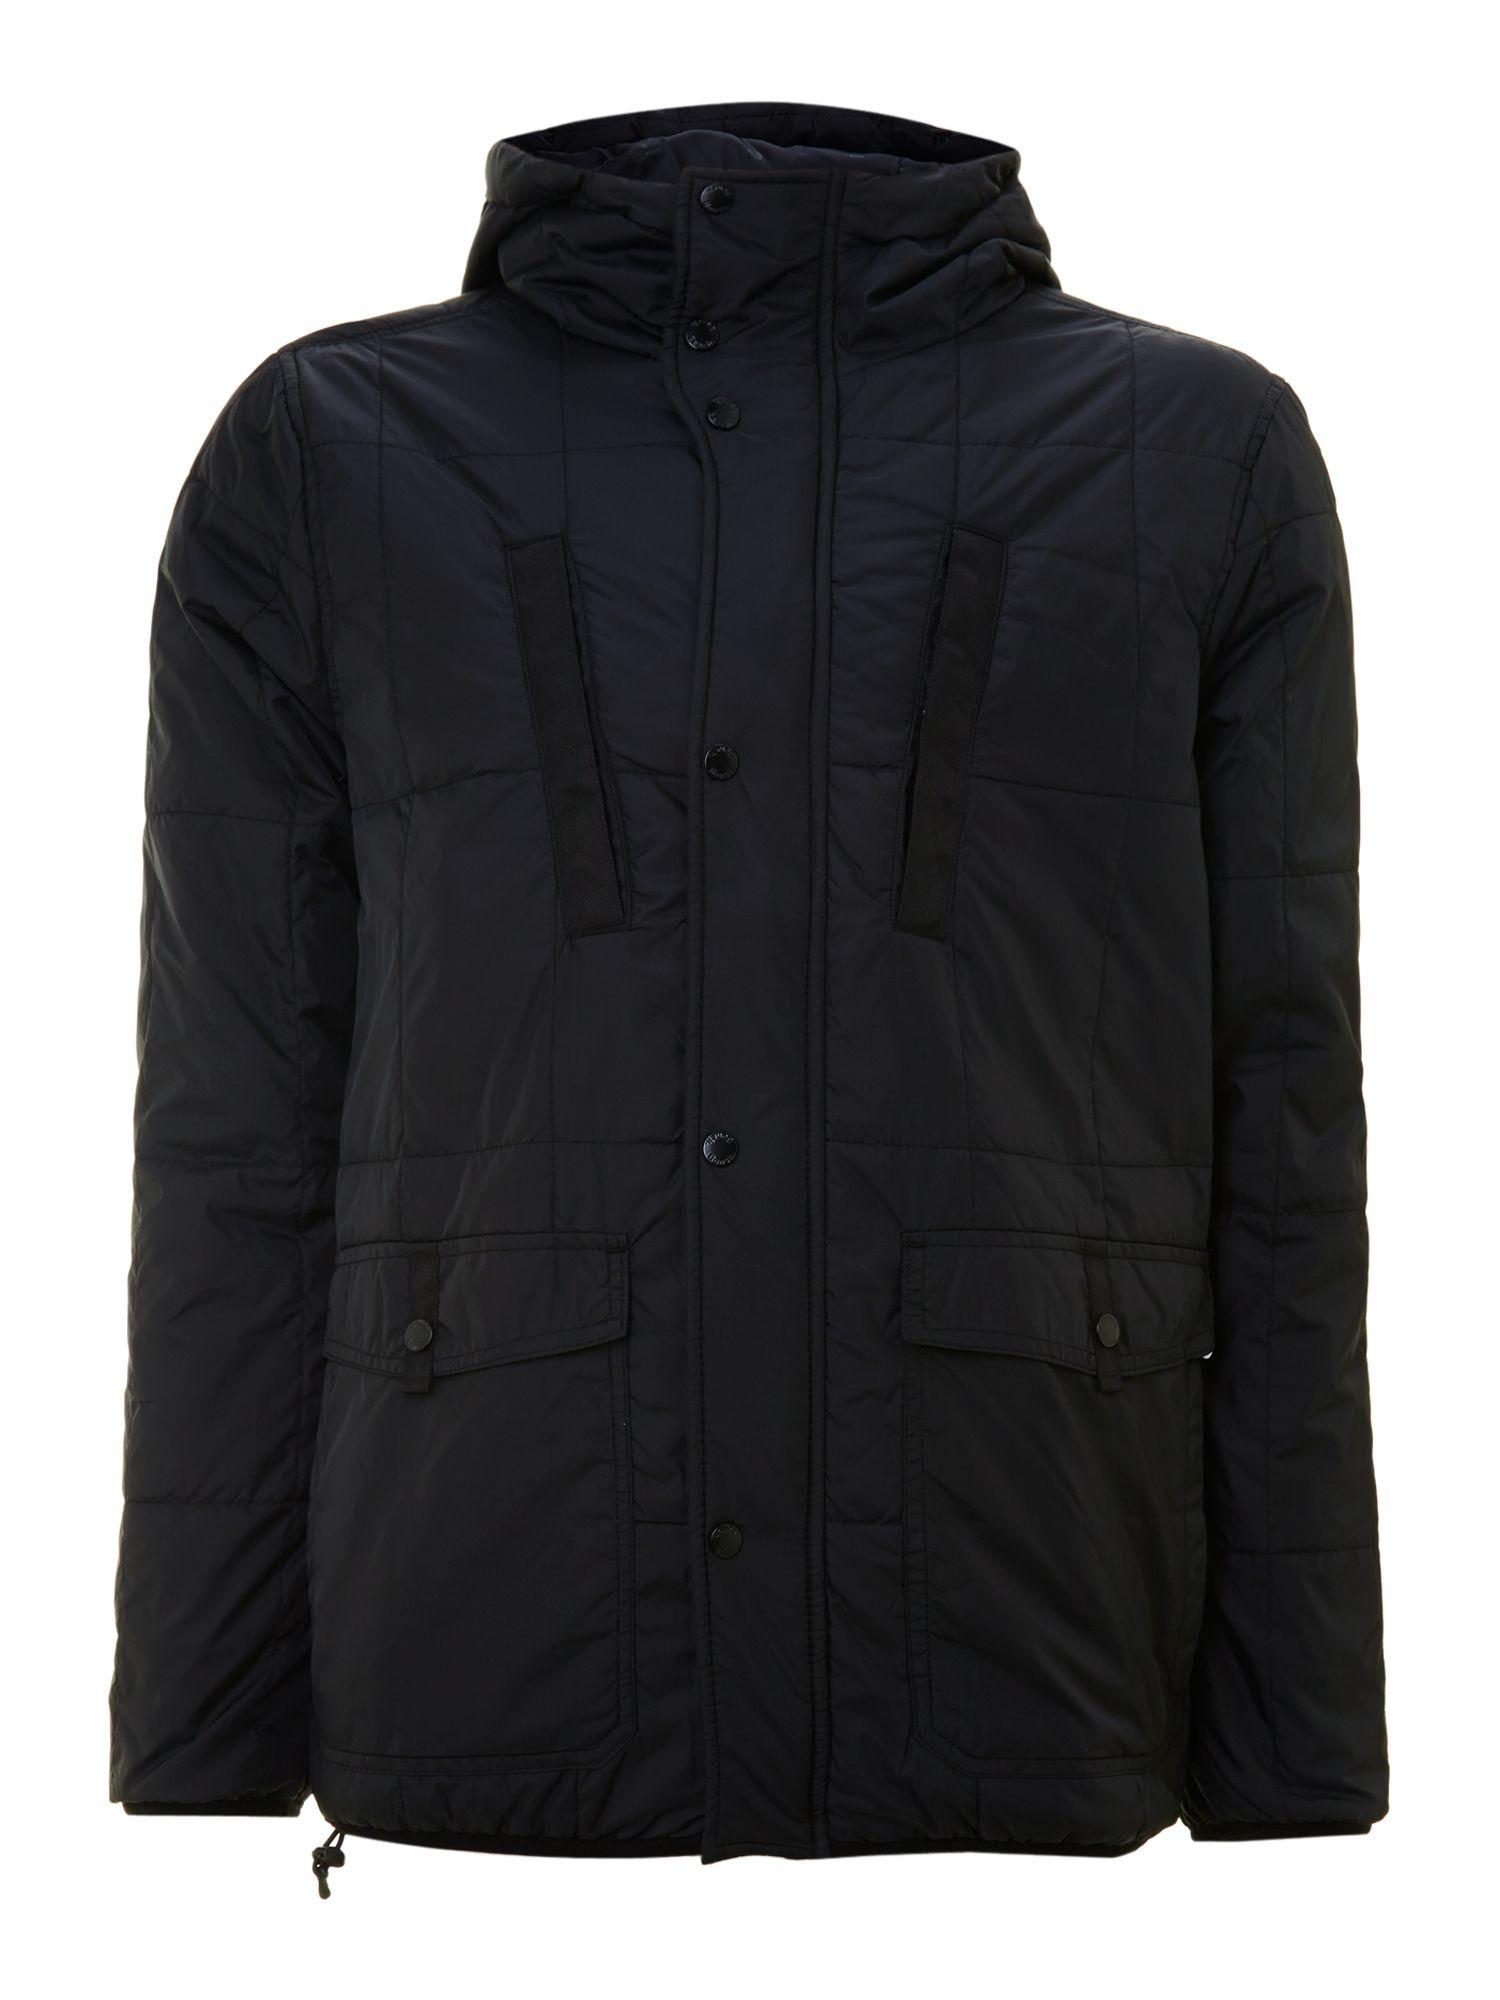 Bench Hooded Puffer Jacket In Black For Men Lyst